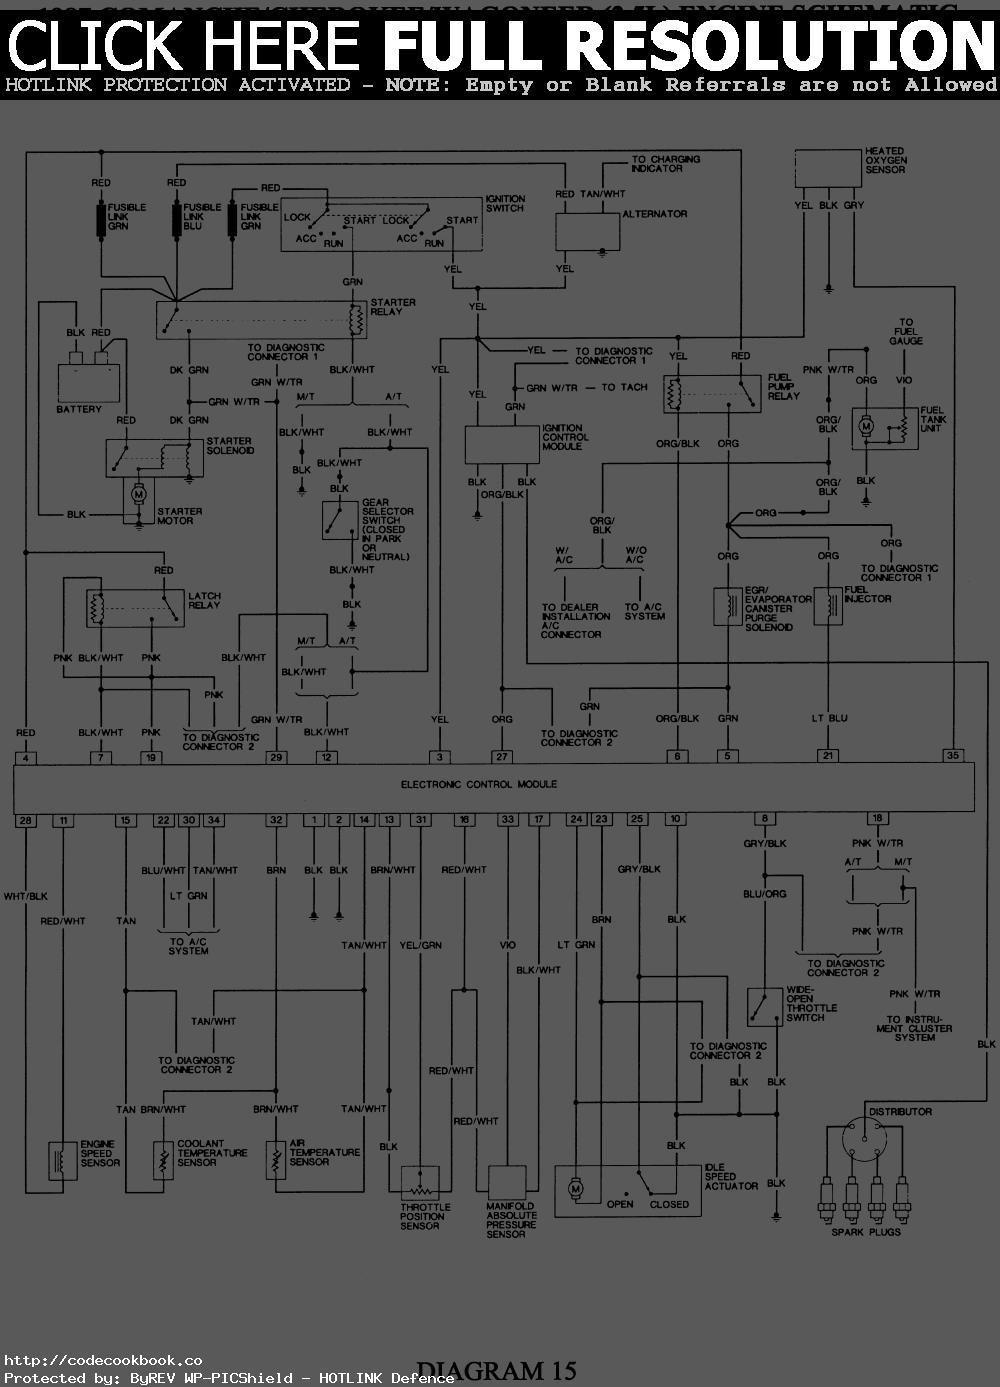 1989 jeep wrangler wiring diagram hk 7368  97 jeep wiring diagram  hk 7368  97 jeep wiring diagram